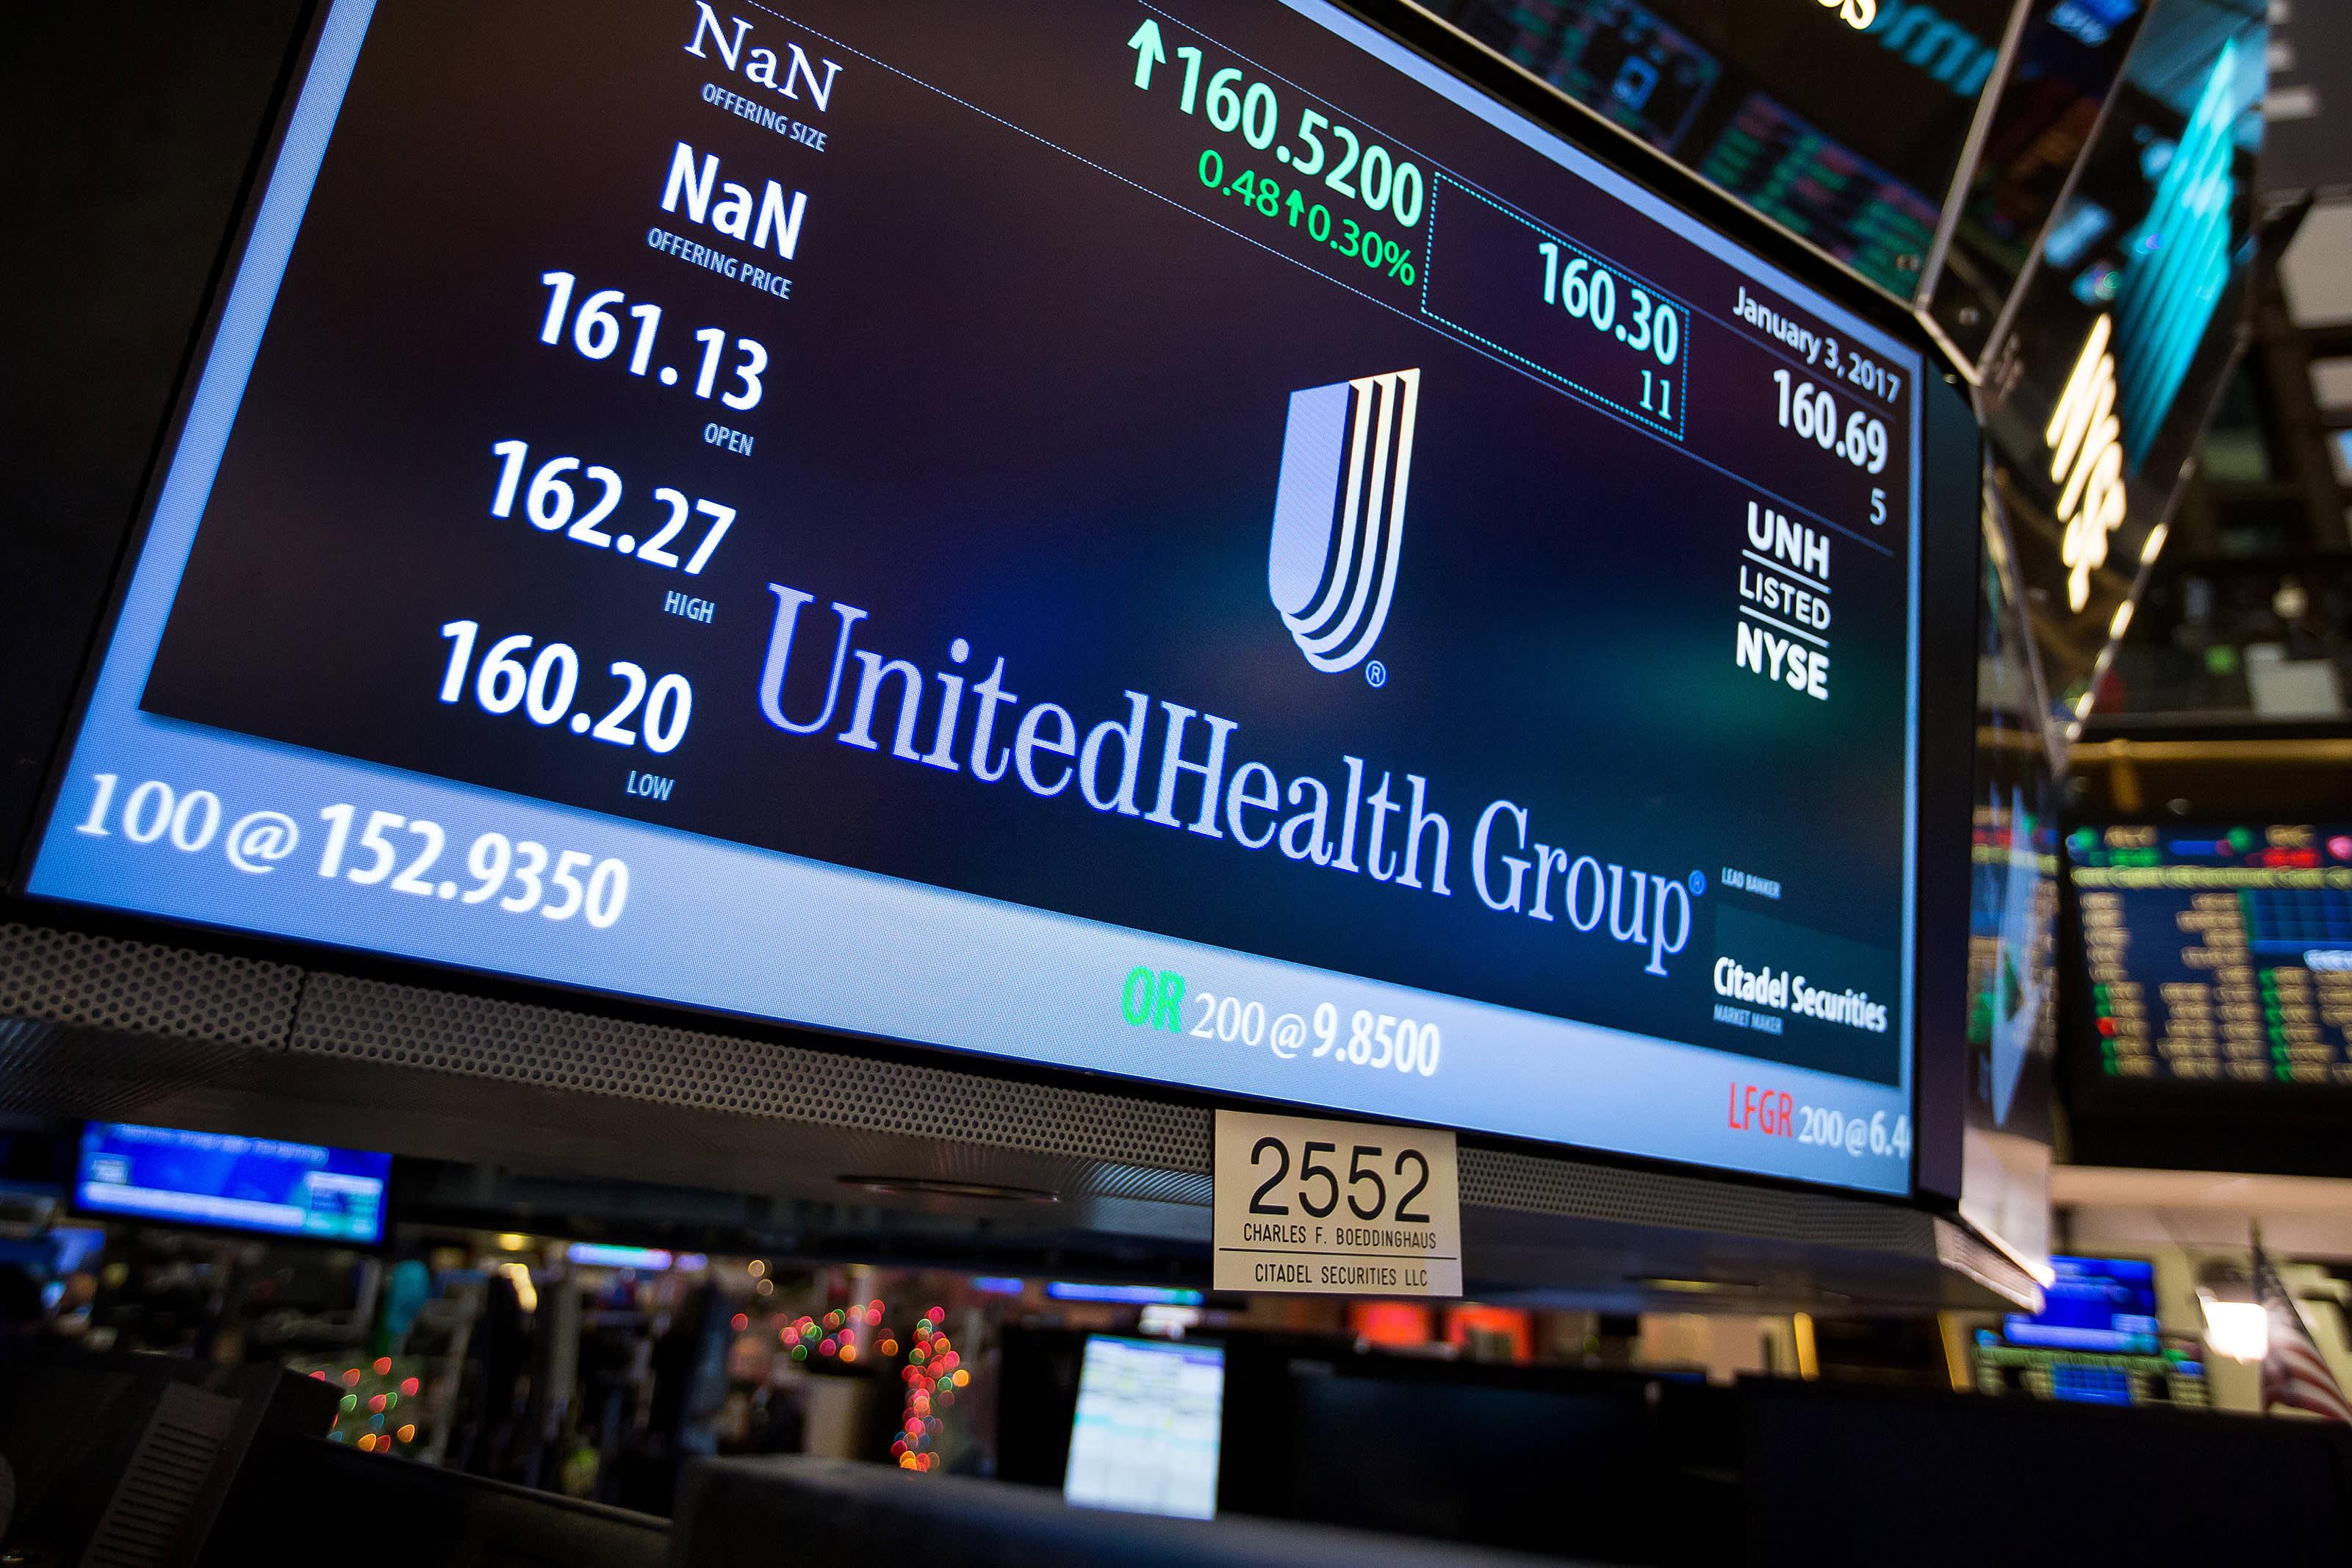 UNH Stock Price Quote & News - UnitedHealth   Robinhood